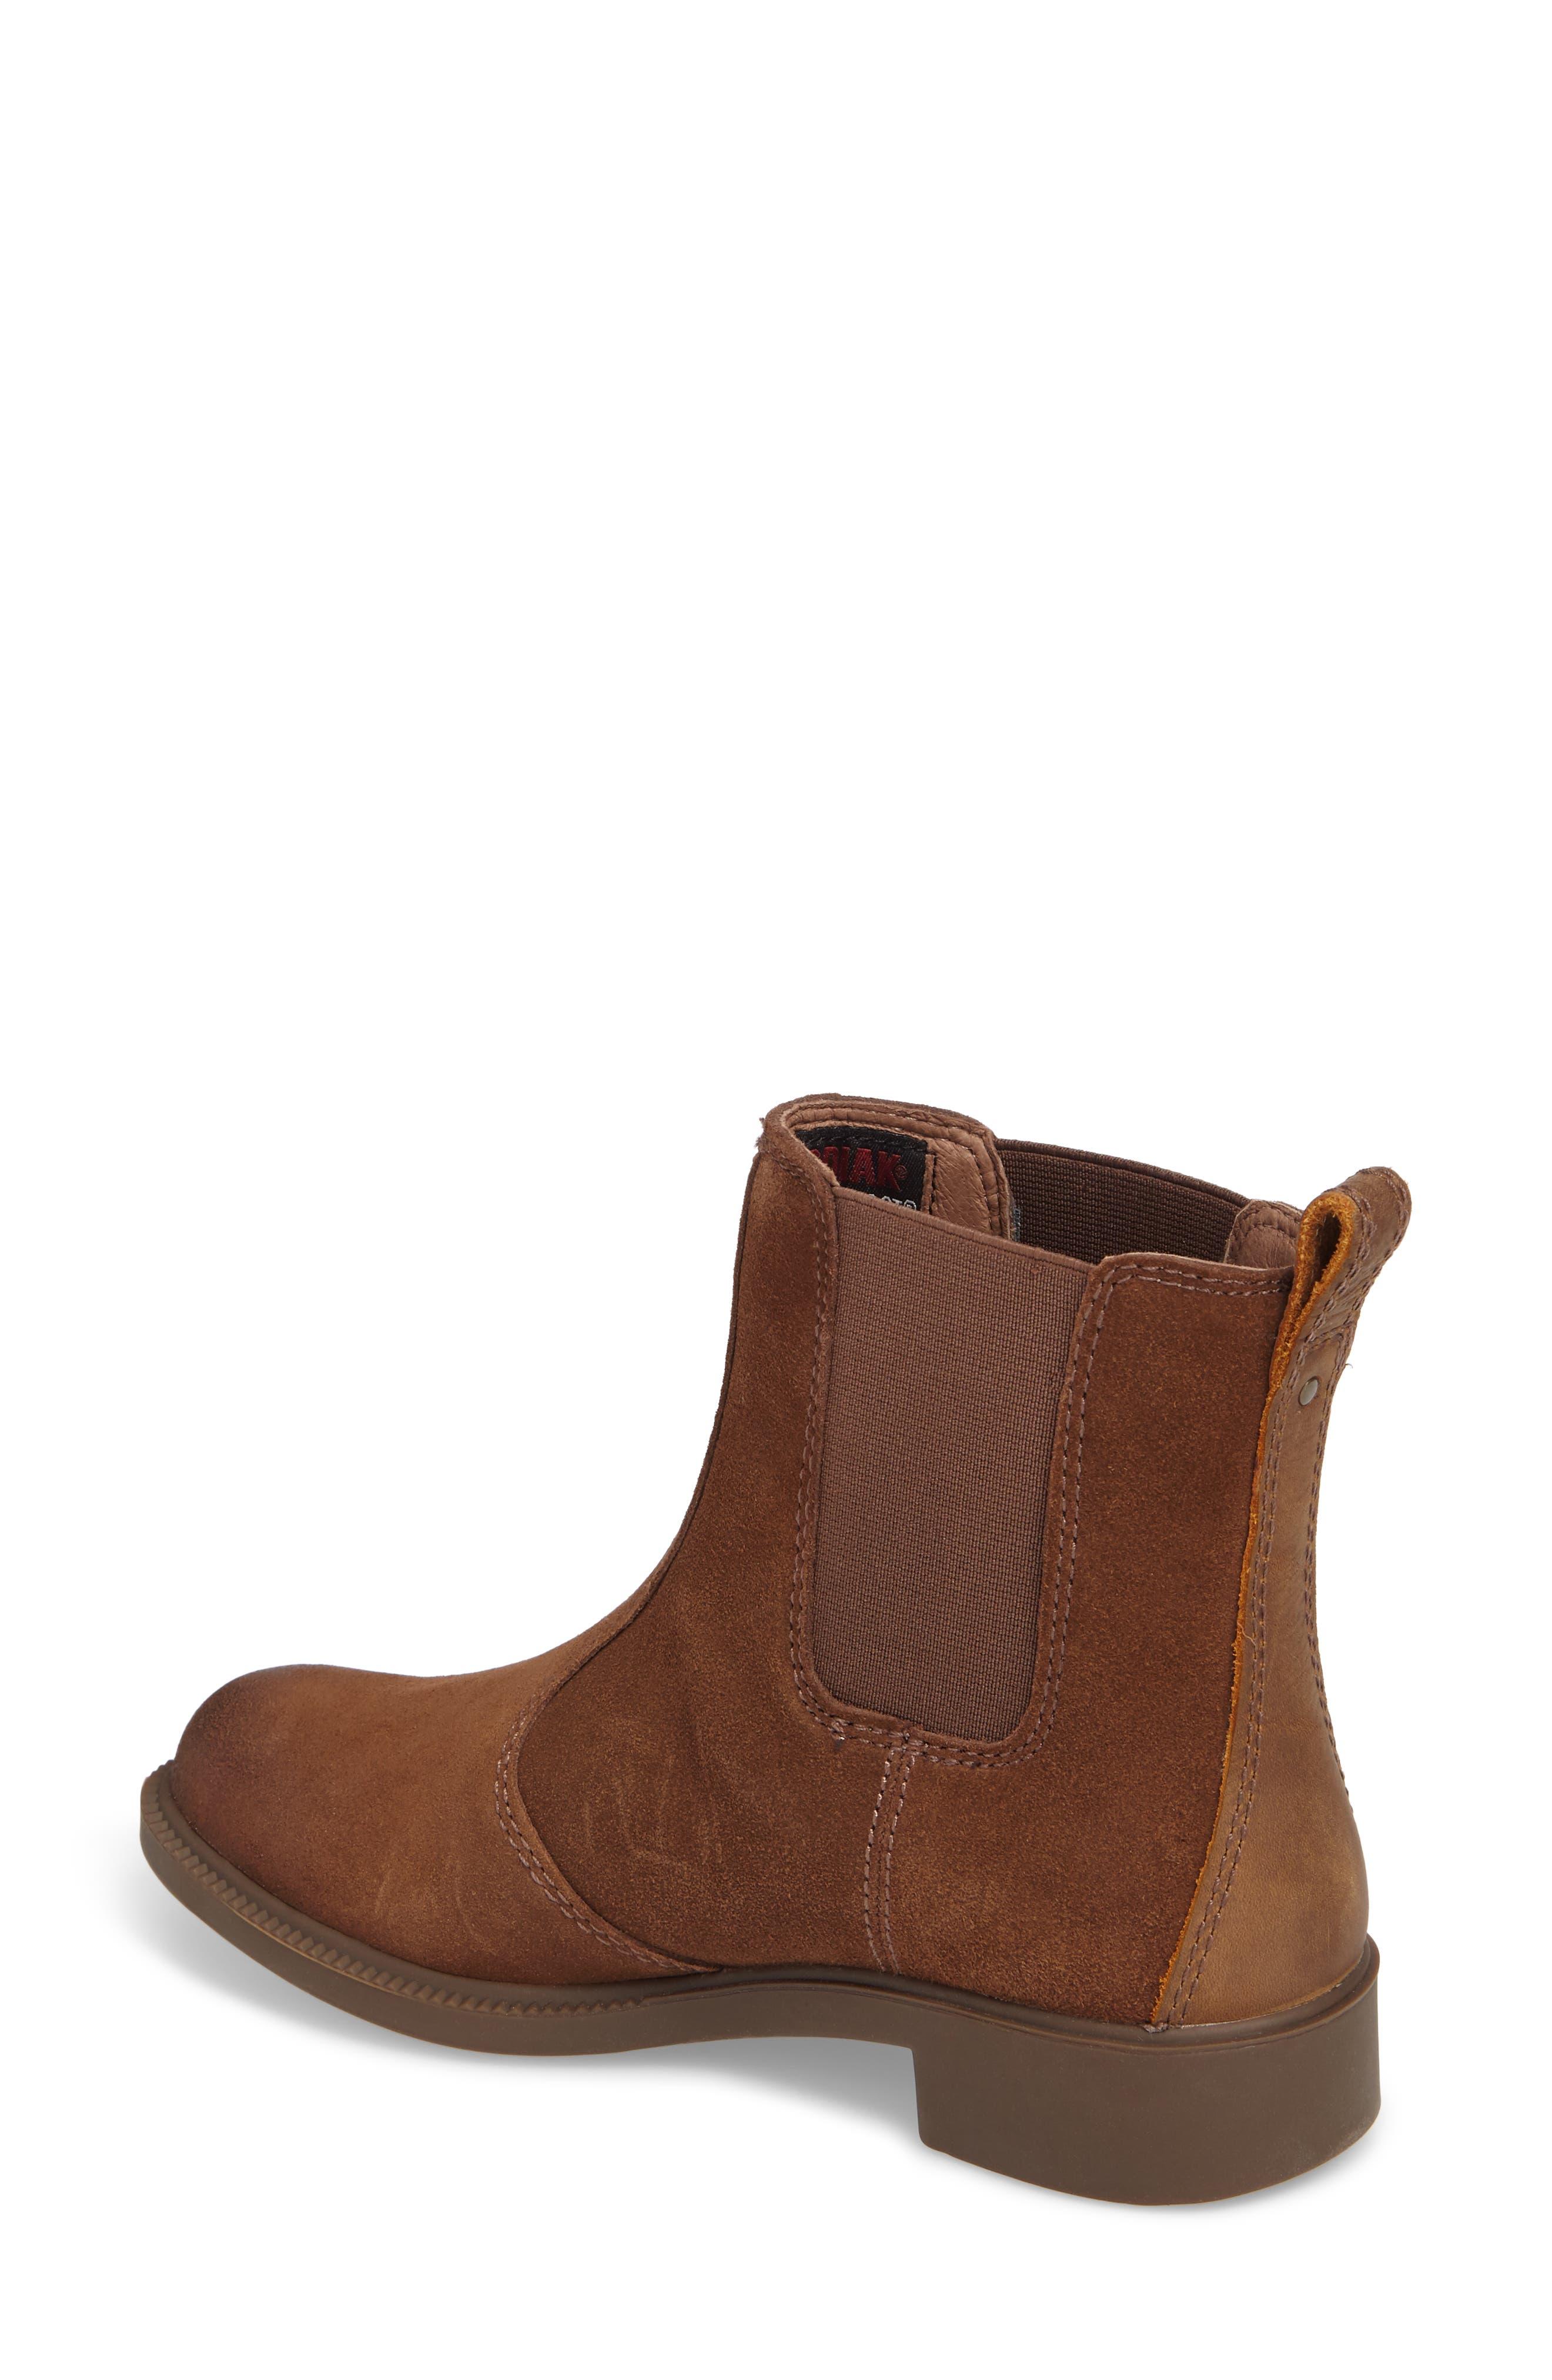 Bria Waterproof Chelsea Boot,                             Alternate thumbnail 6, color,